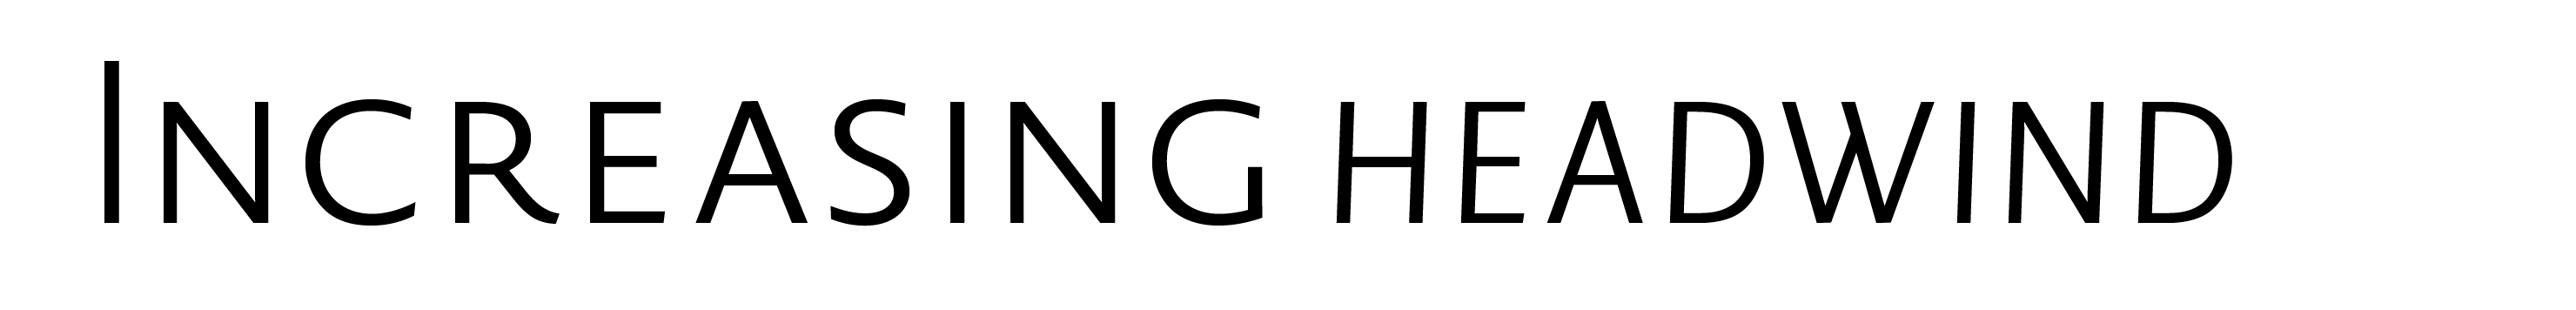 Typeface Novel Sans D07 Atlas Font Foundry